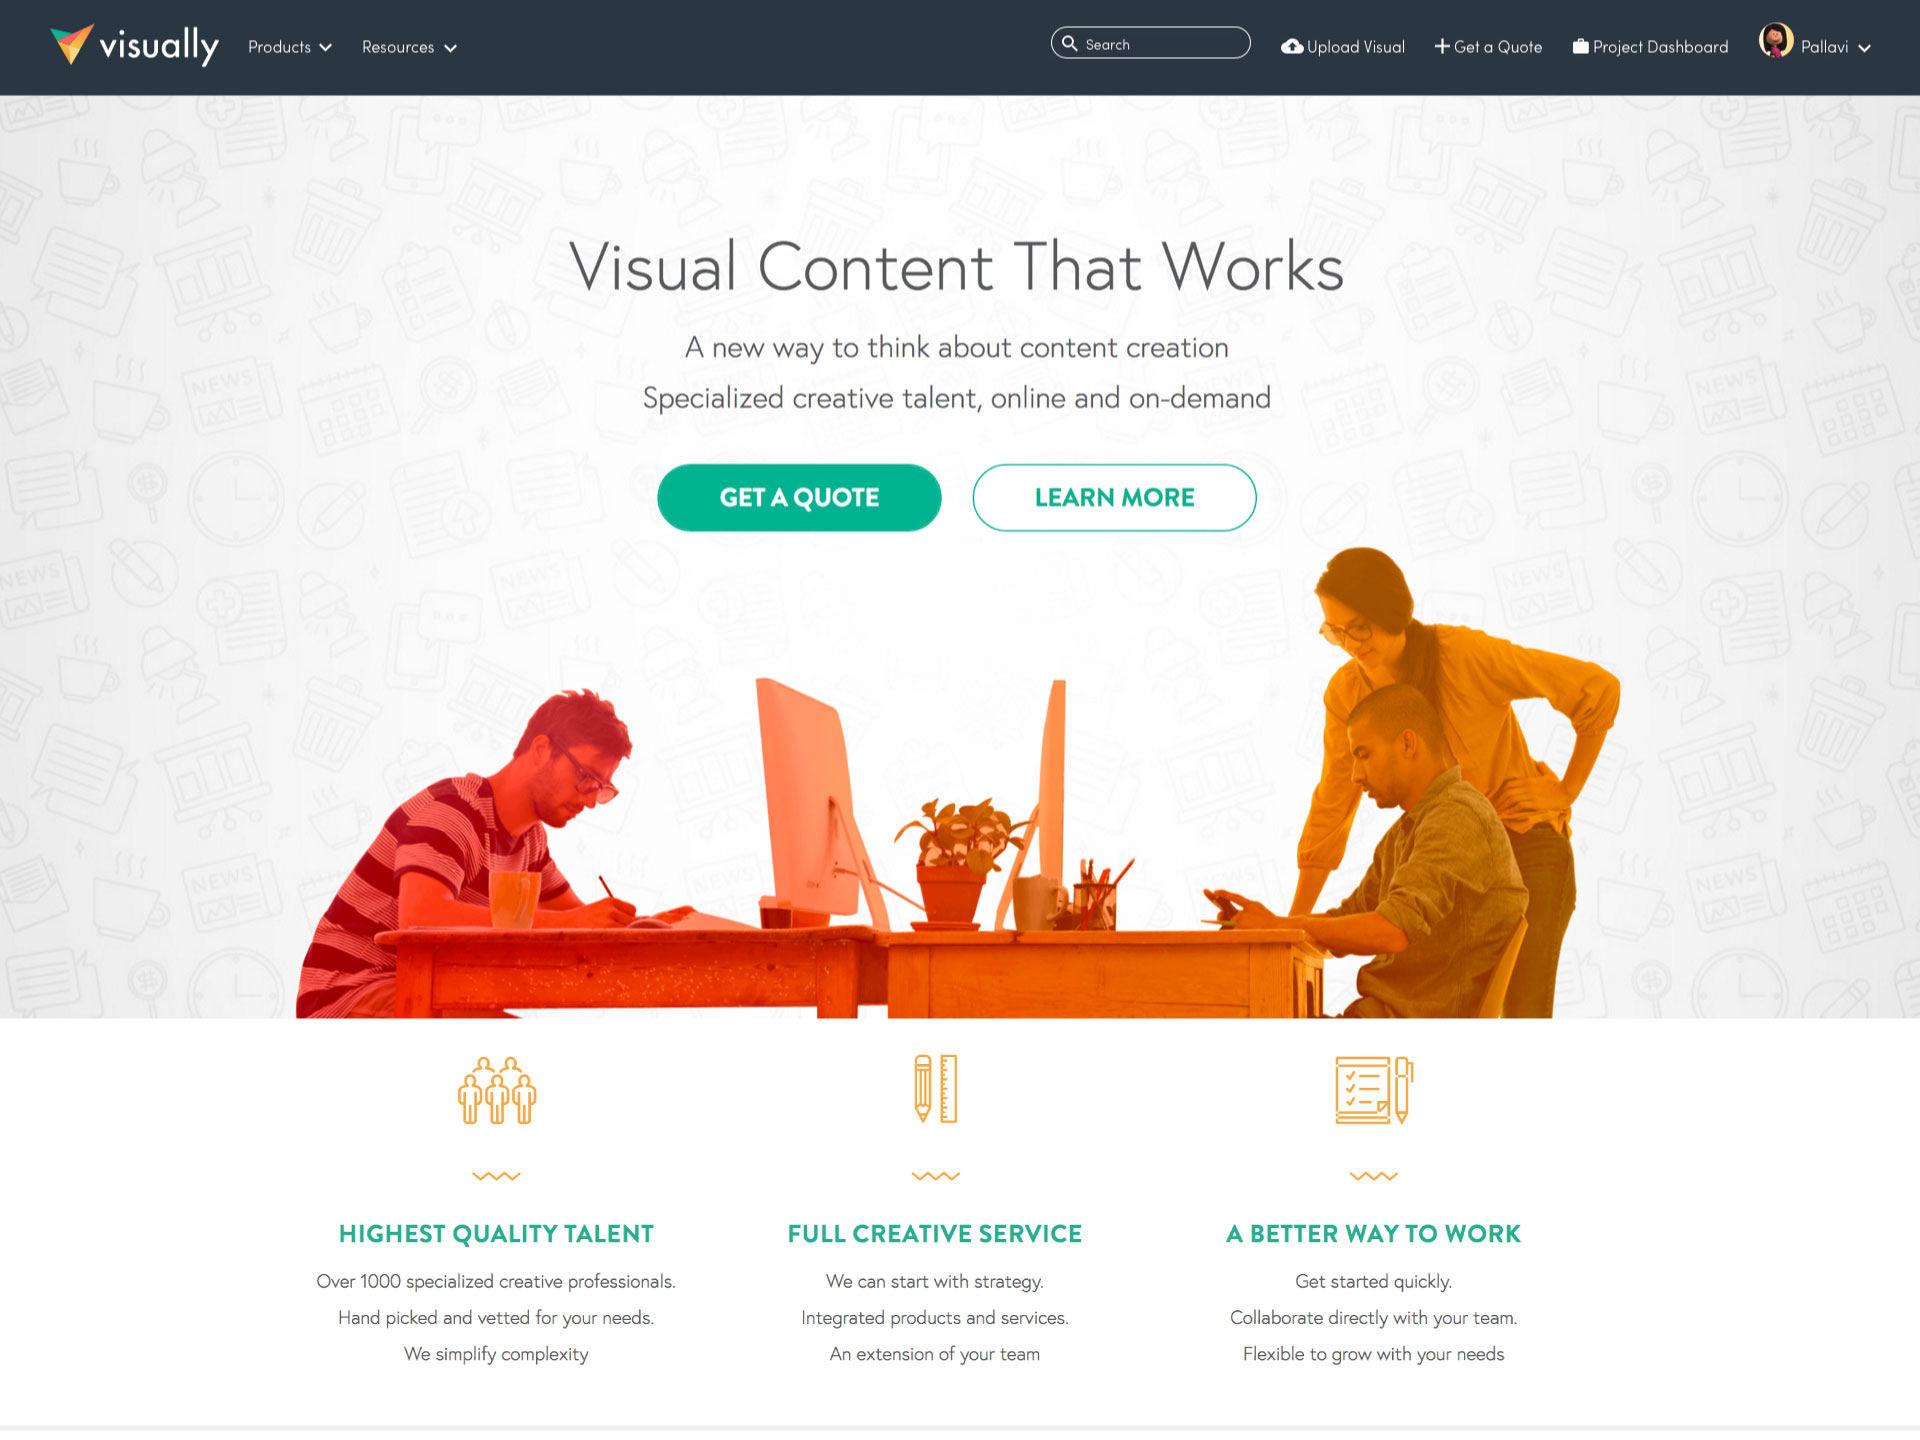 visually-here-loggedin-new6